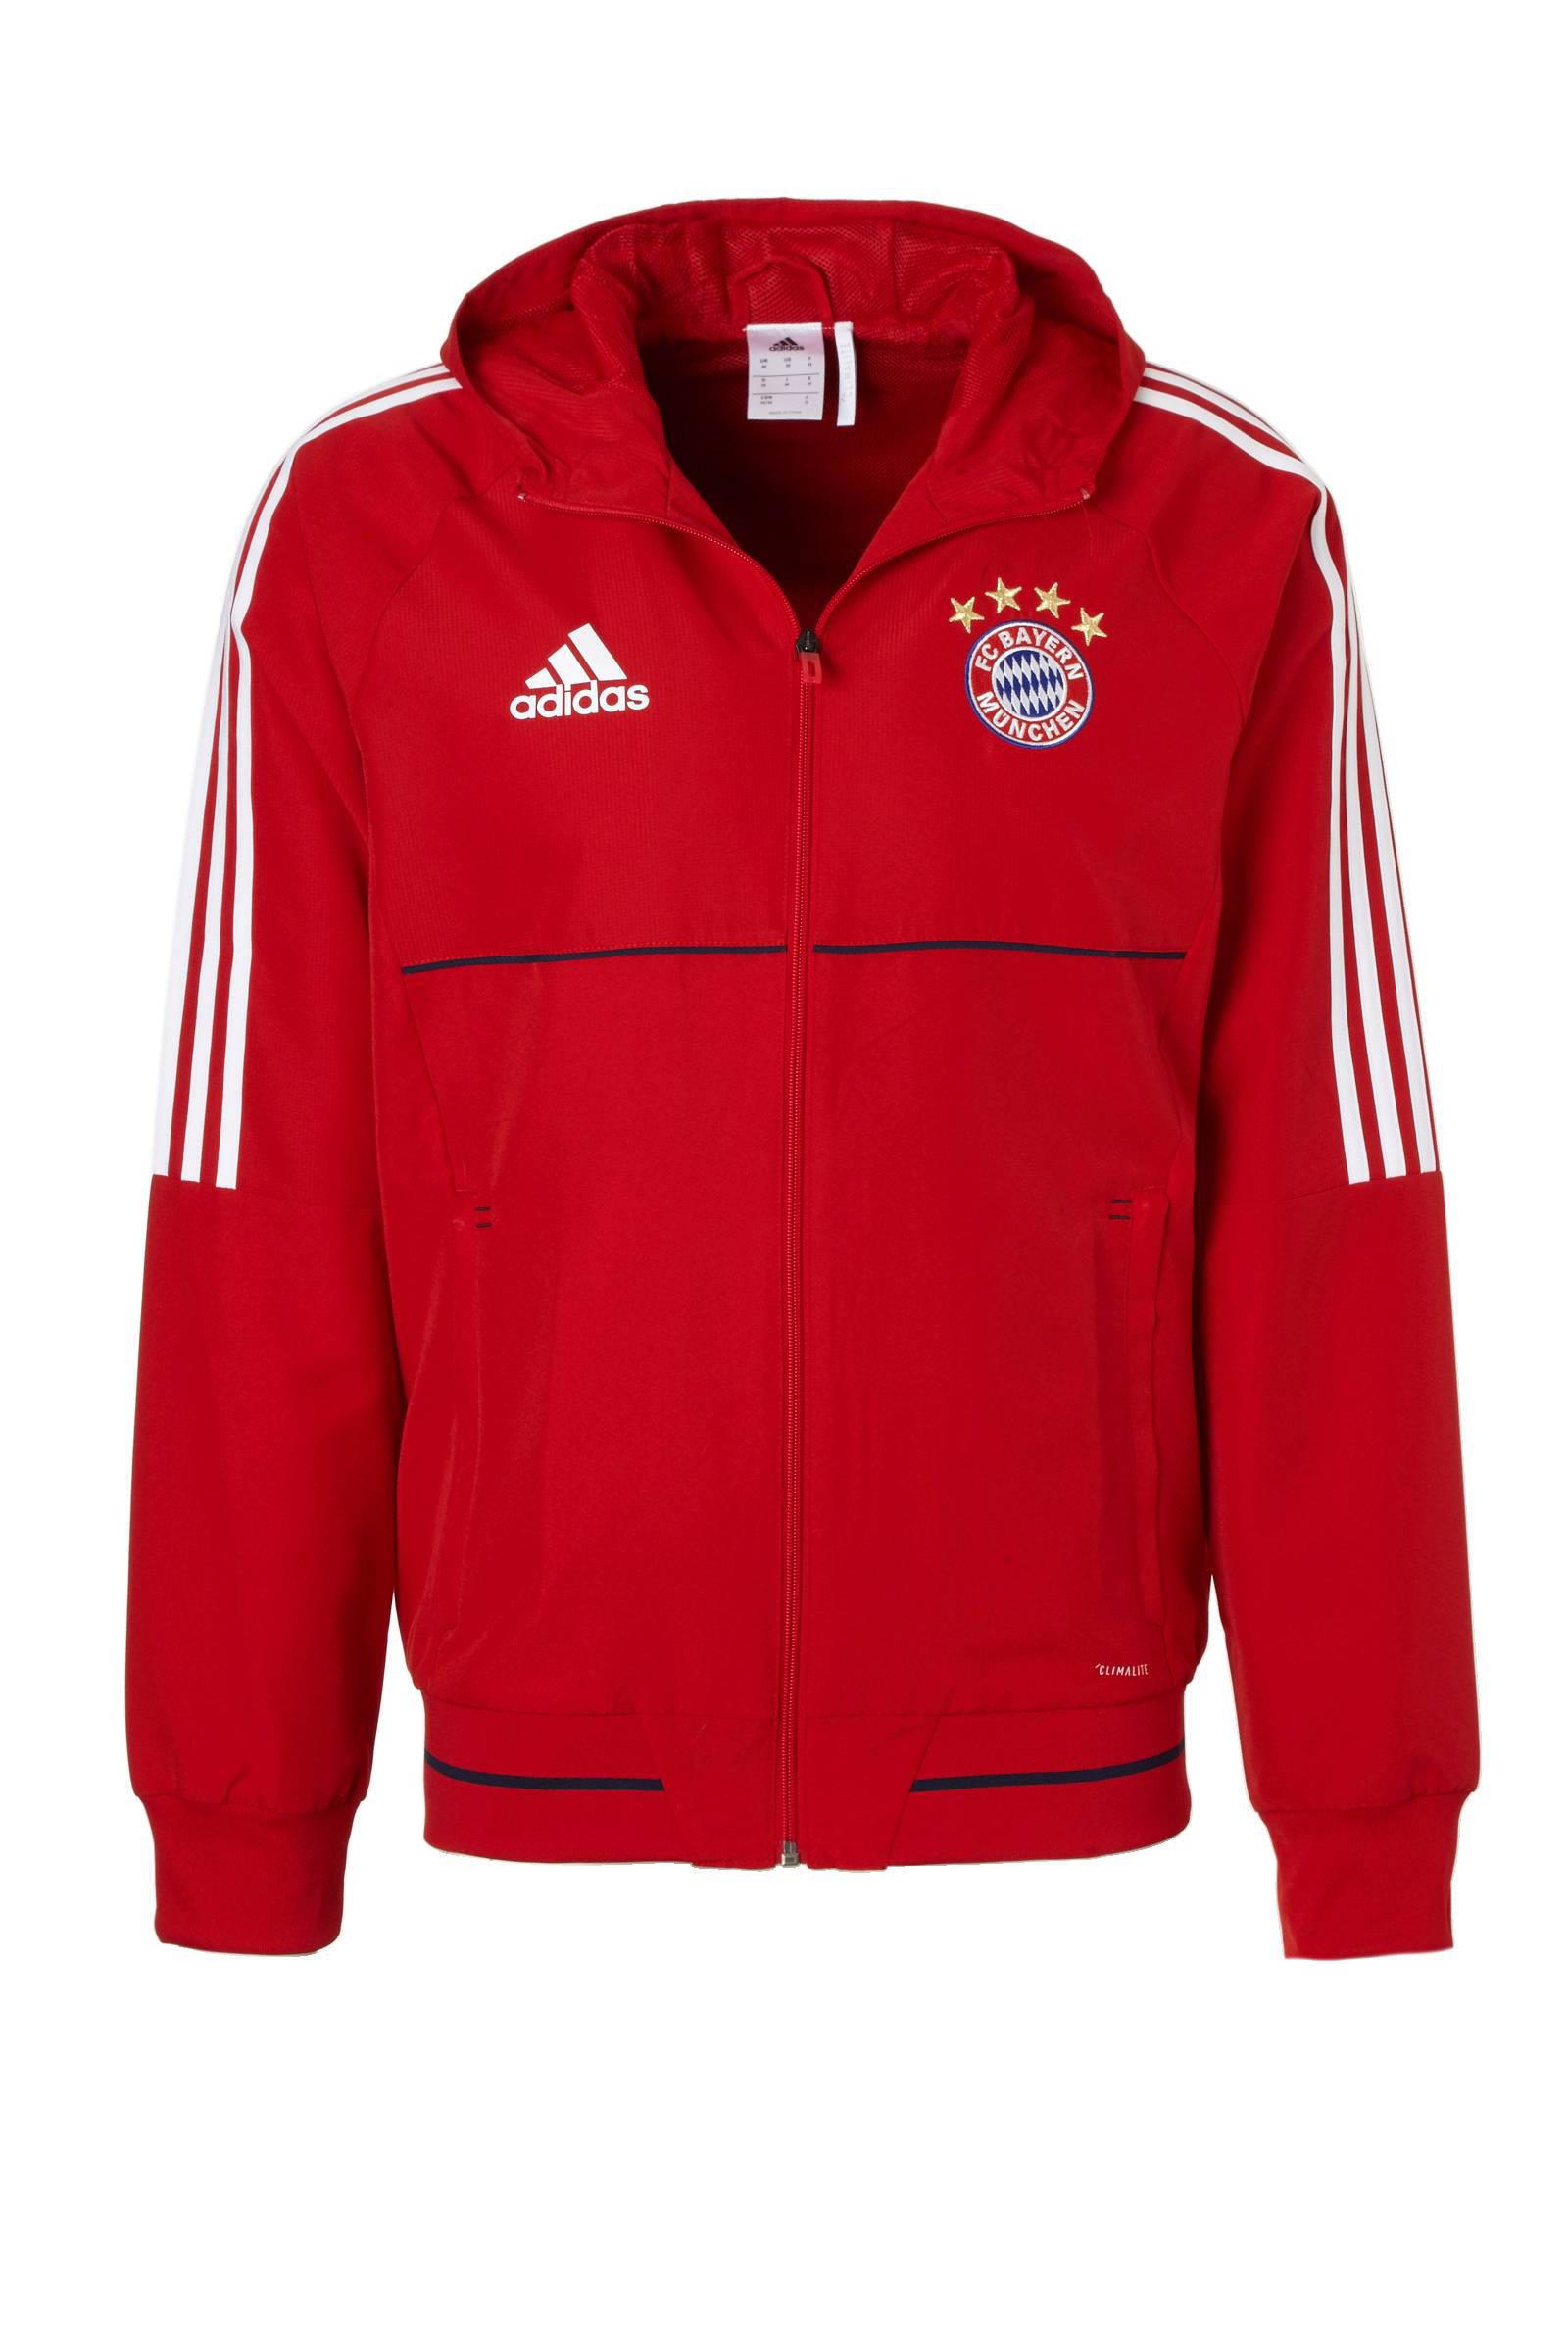 adidas performance adidas Performance Senior FC Bayern